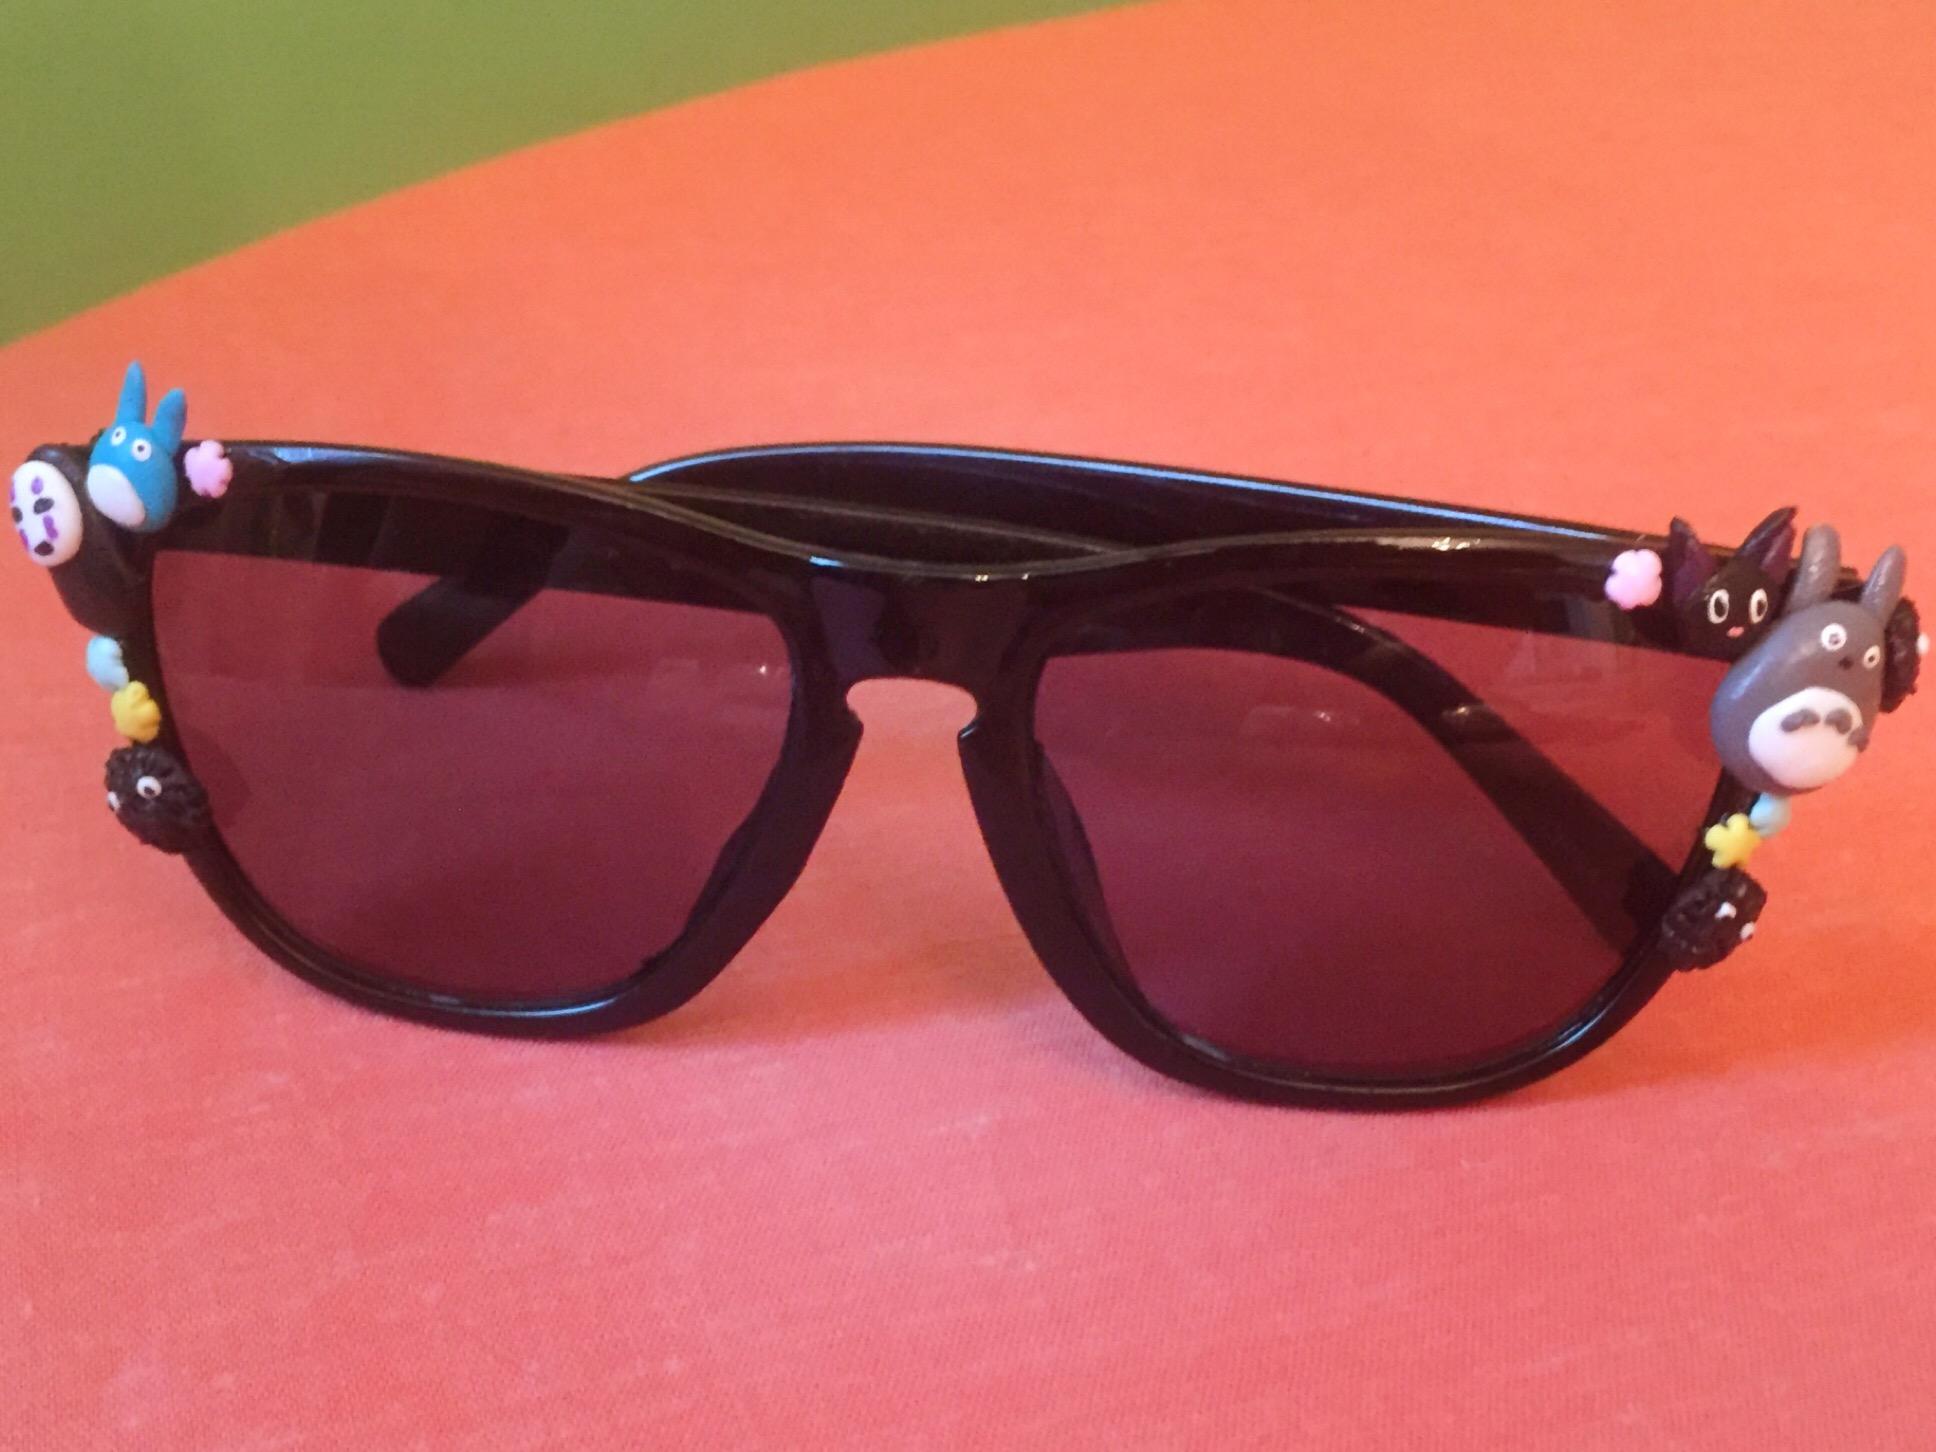 608a13182d02582875d94394d4cb160c--piece-of-cakes-dior-sunglasses.jpg